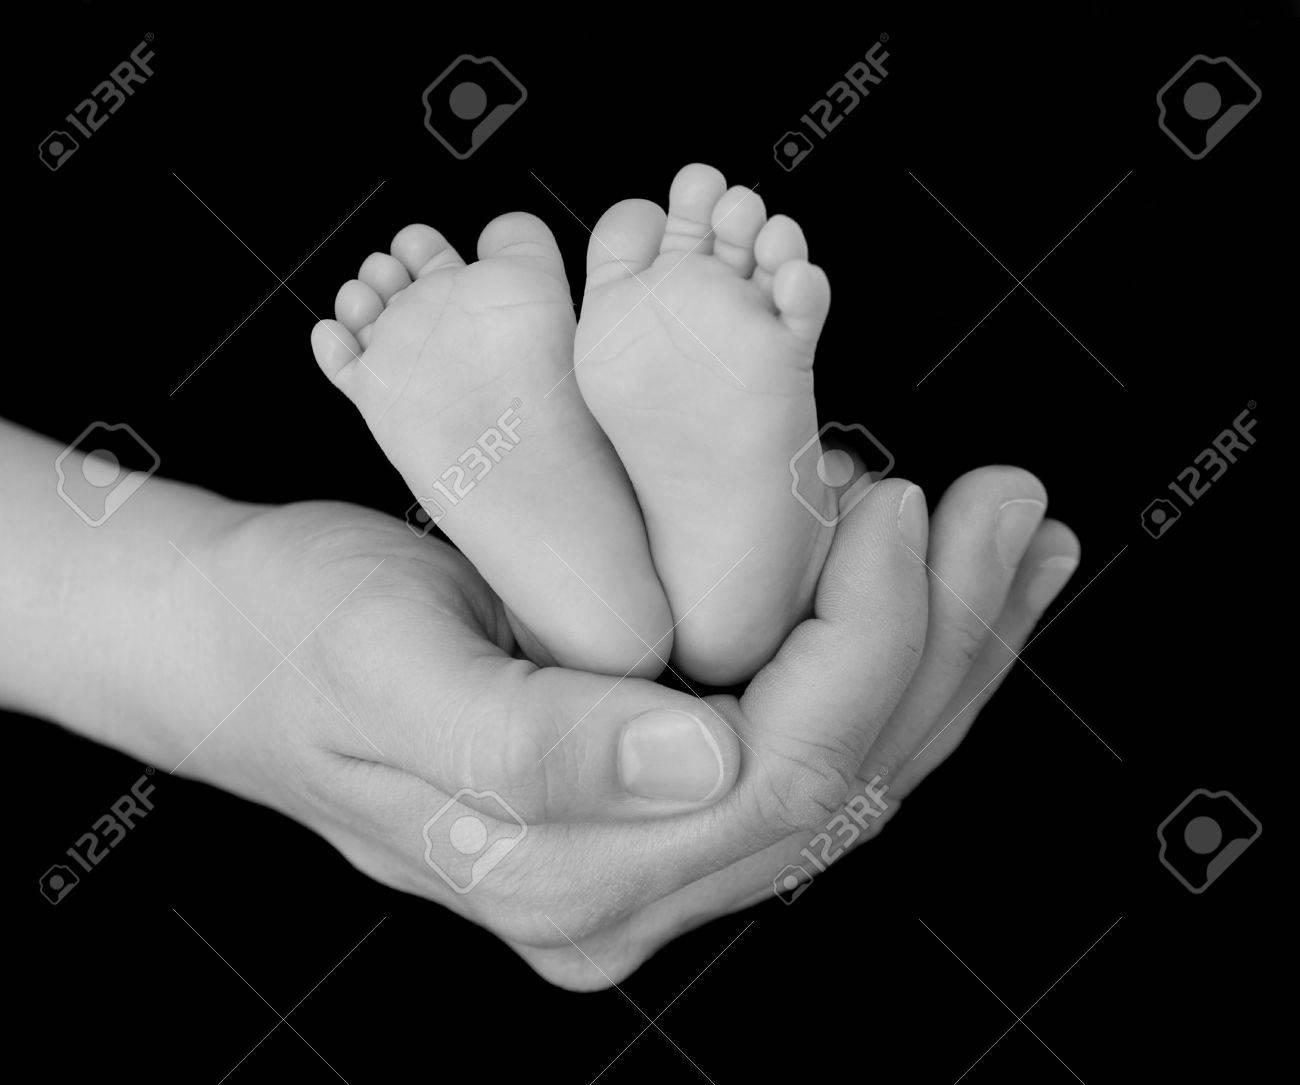 Newborns feet cradled in parents hand stock photo 4554193